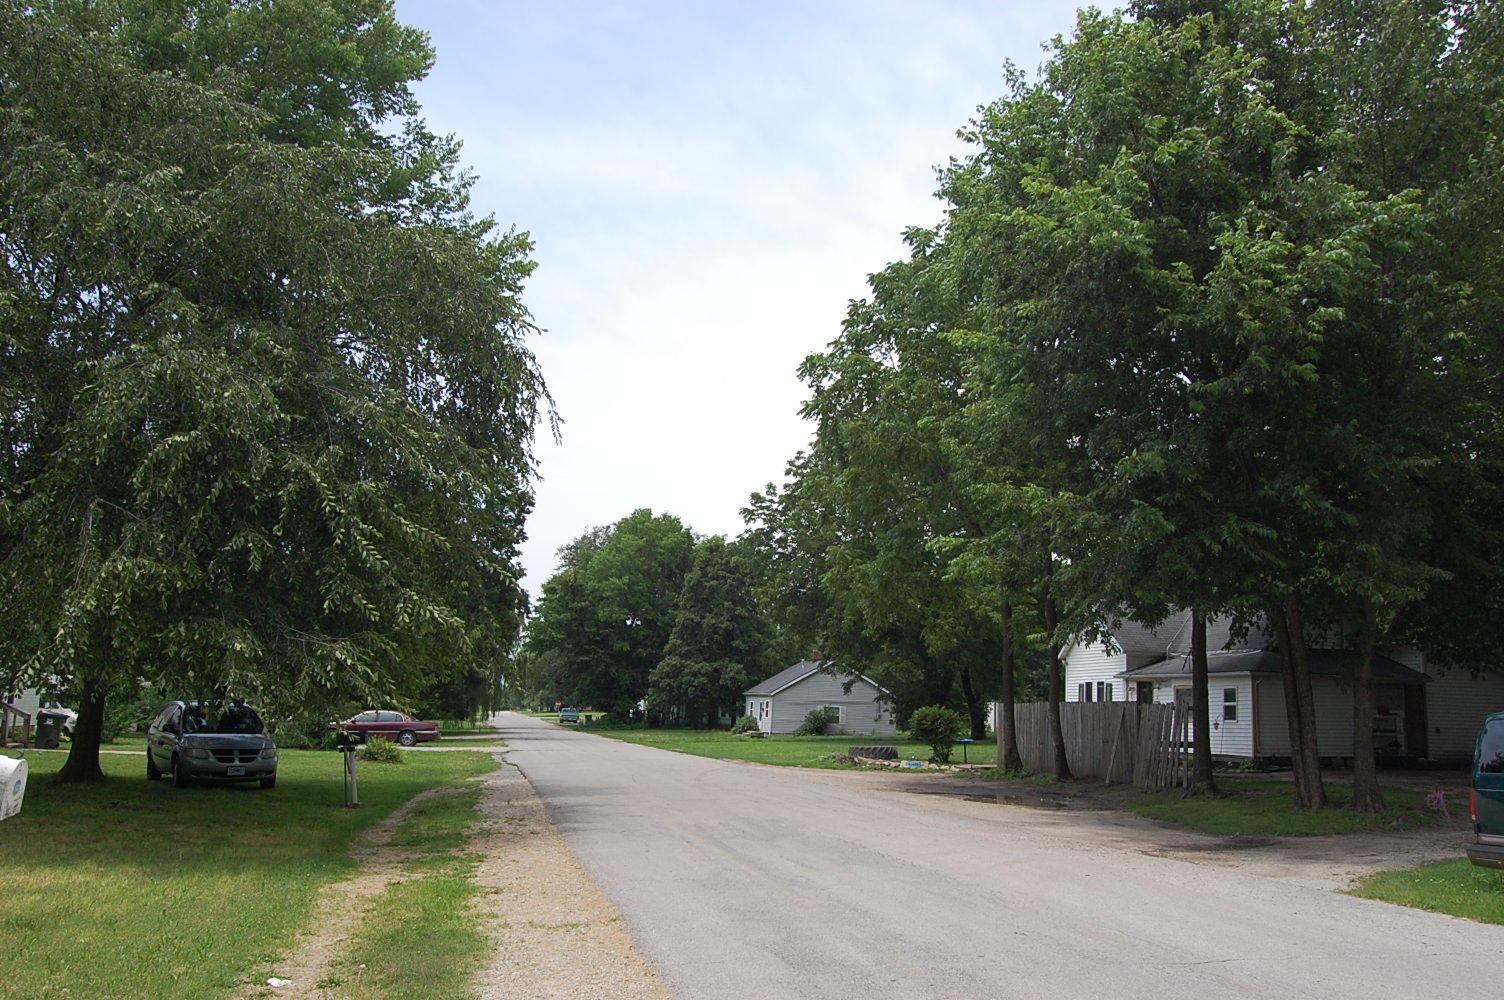 Aurora Missouri Residential Setting - Image 4